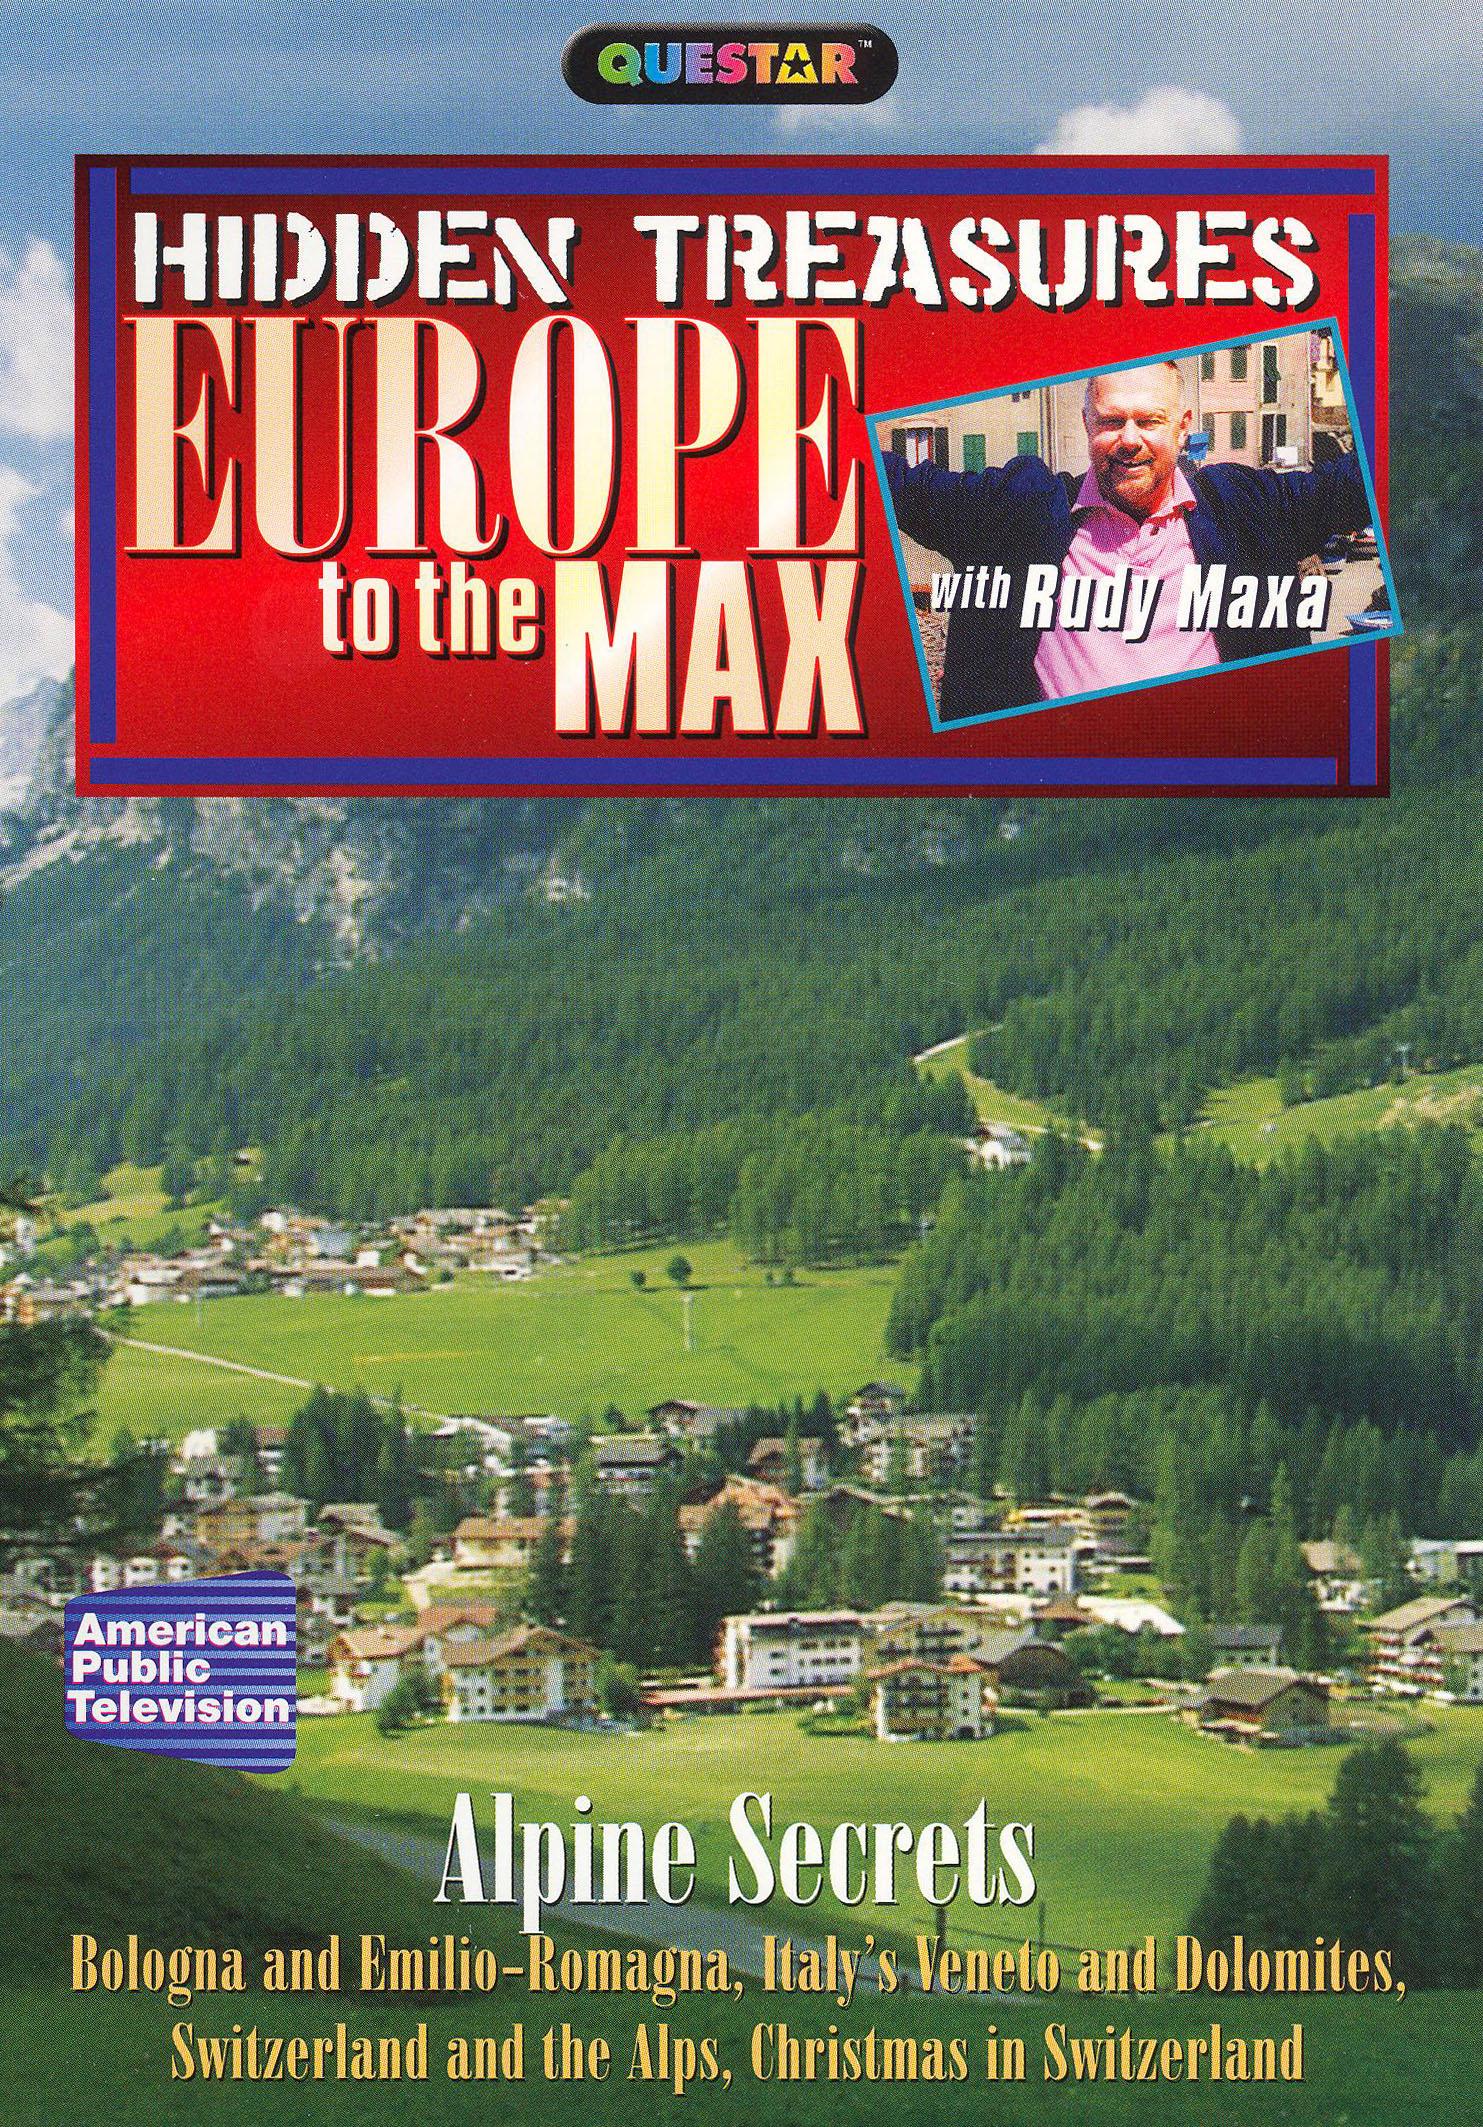 Rudy Maxa: Europe to the Max: Hidden Treasures - Alpine Secrets